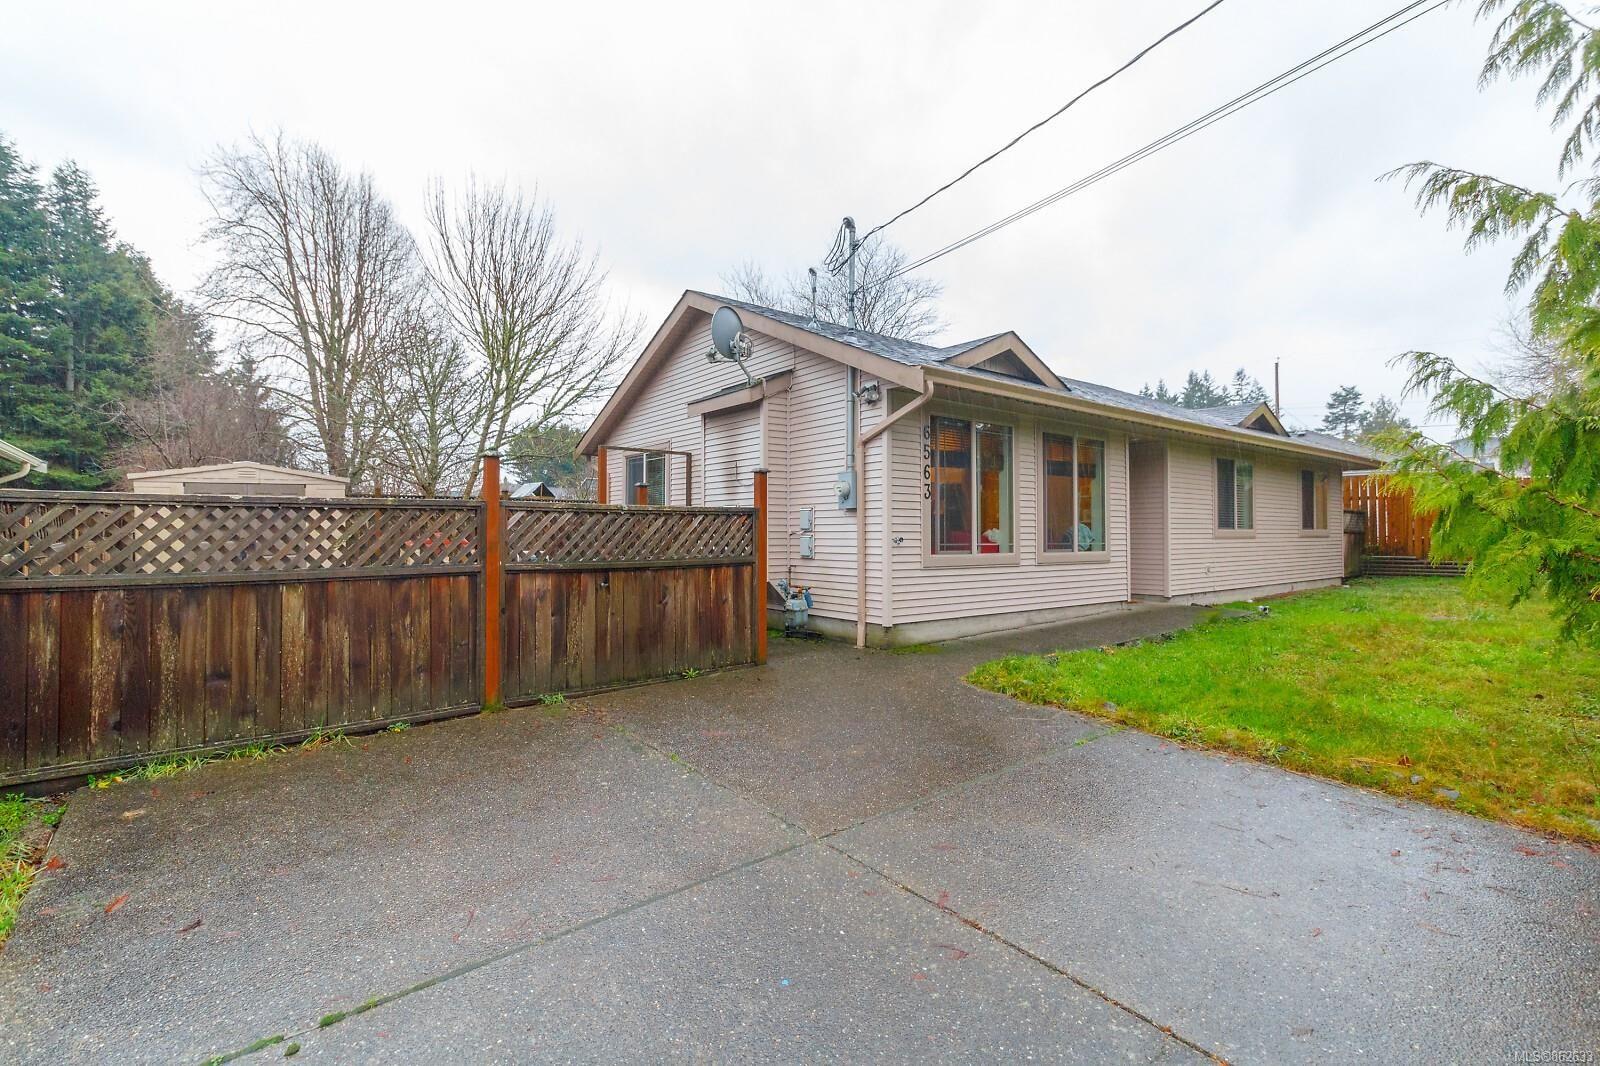 Main Photo: 6563 E Grant Rd in : Sk Sooke Vill Core House for sale (Sooke)  : MLS®# 862633